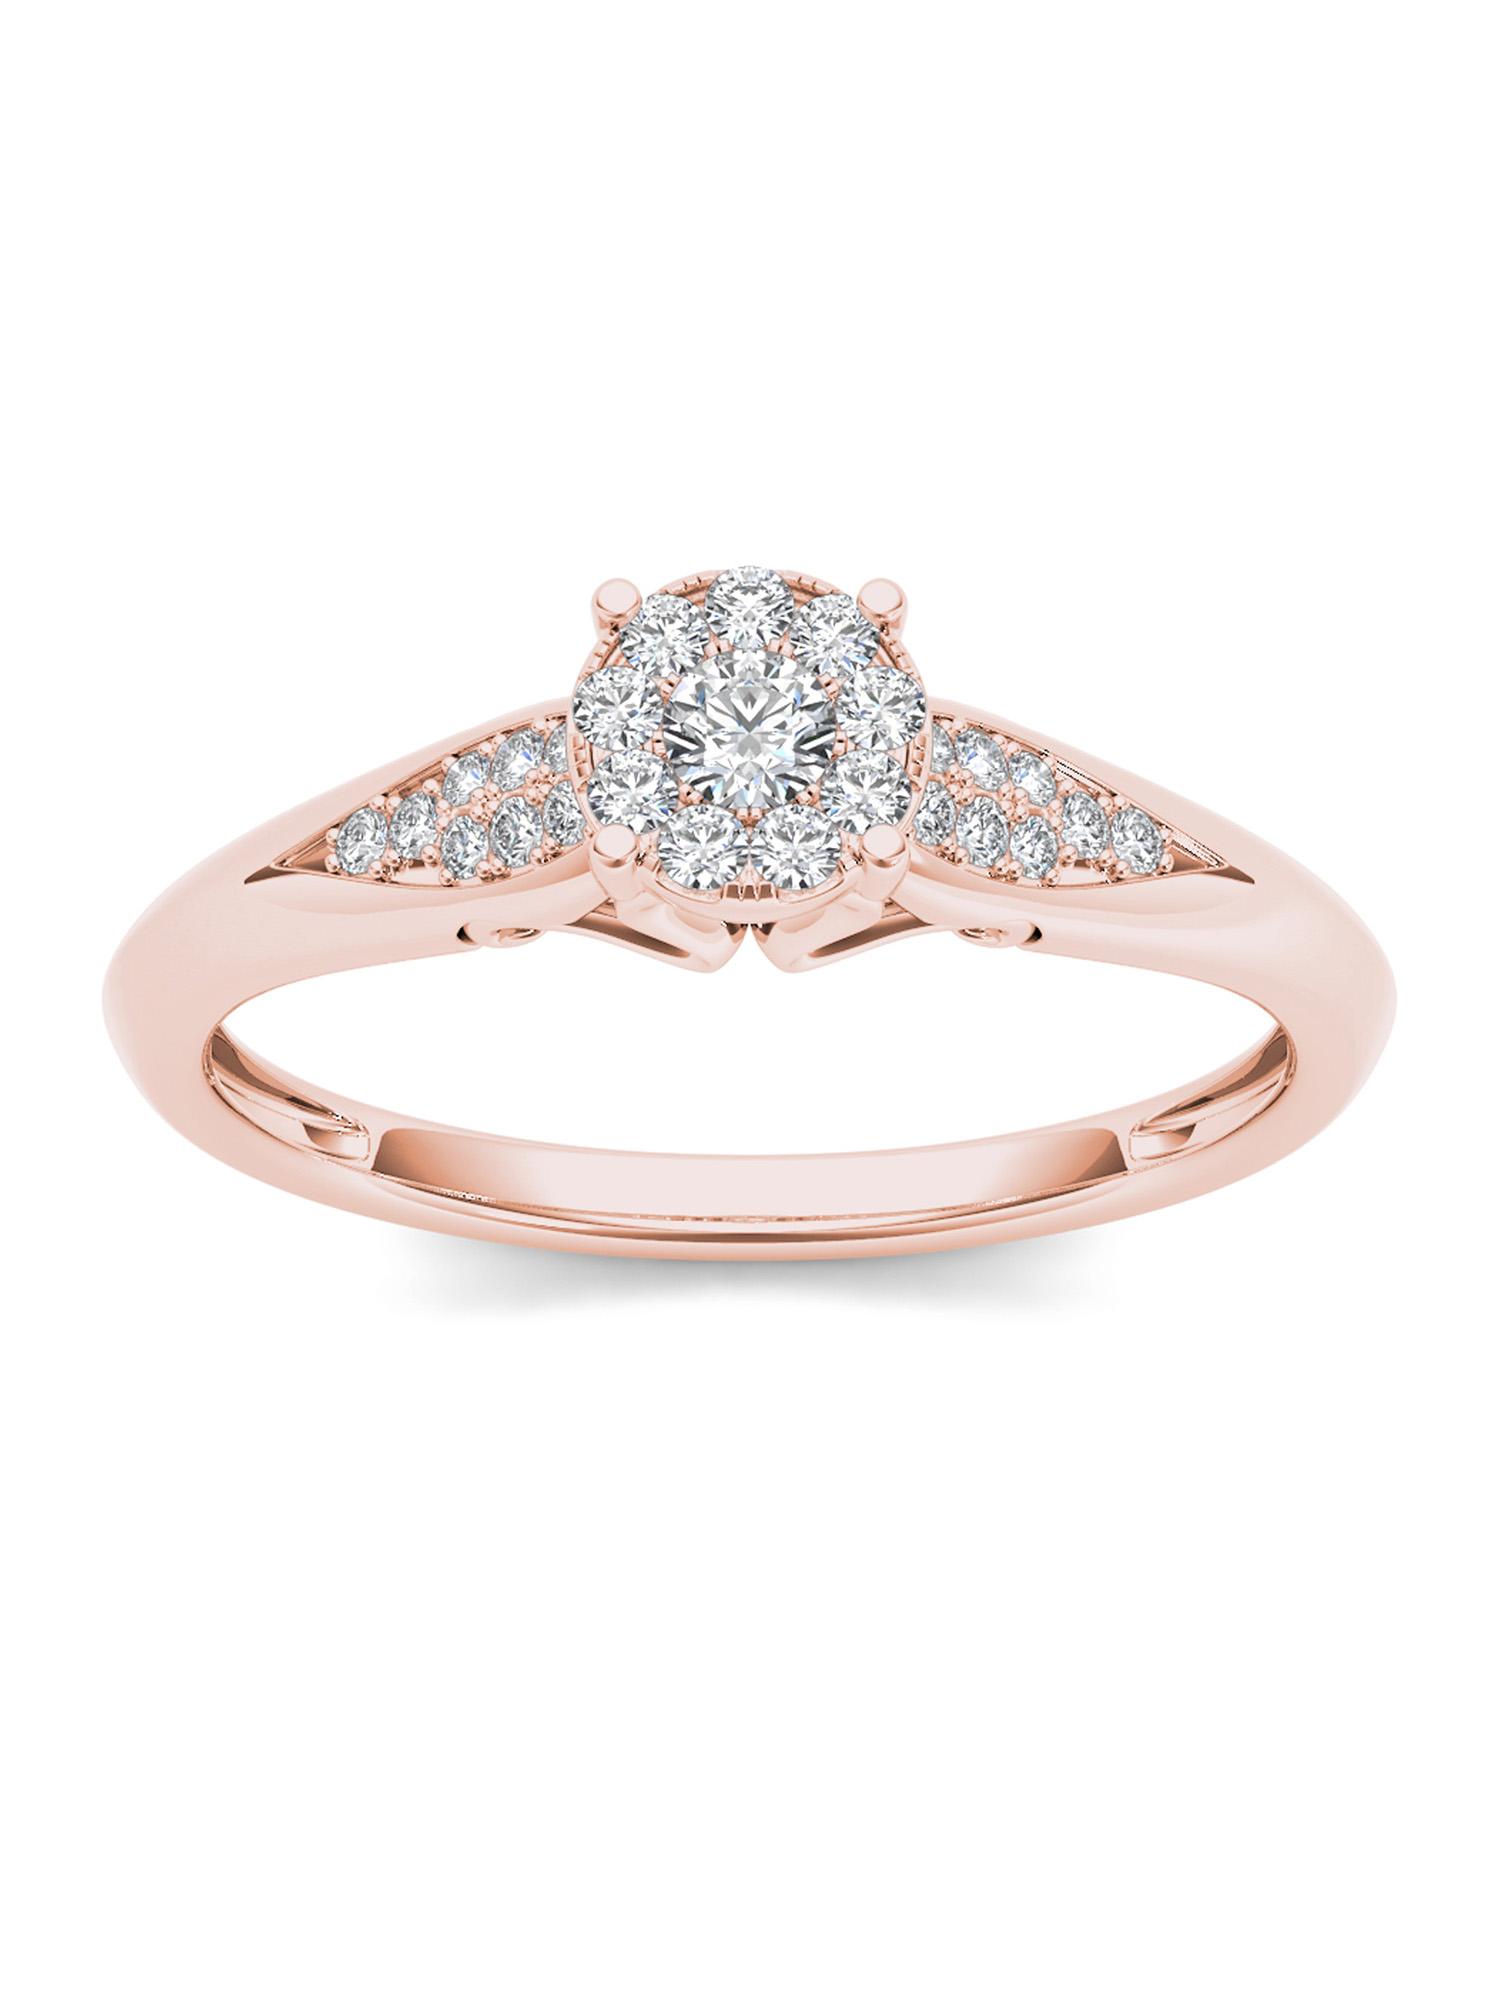 1/6Ct TDW Diamond 10K Rose Gold Cluster Ring Engagement Ring